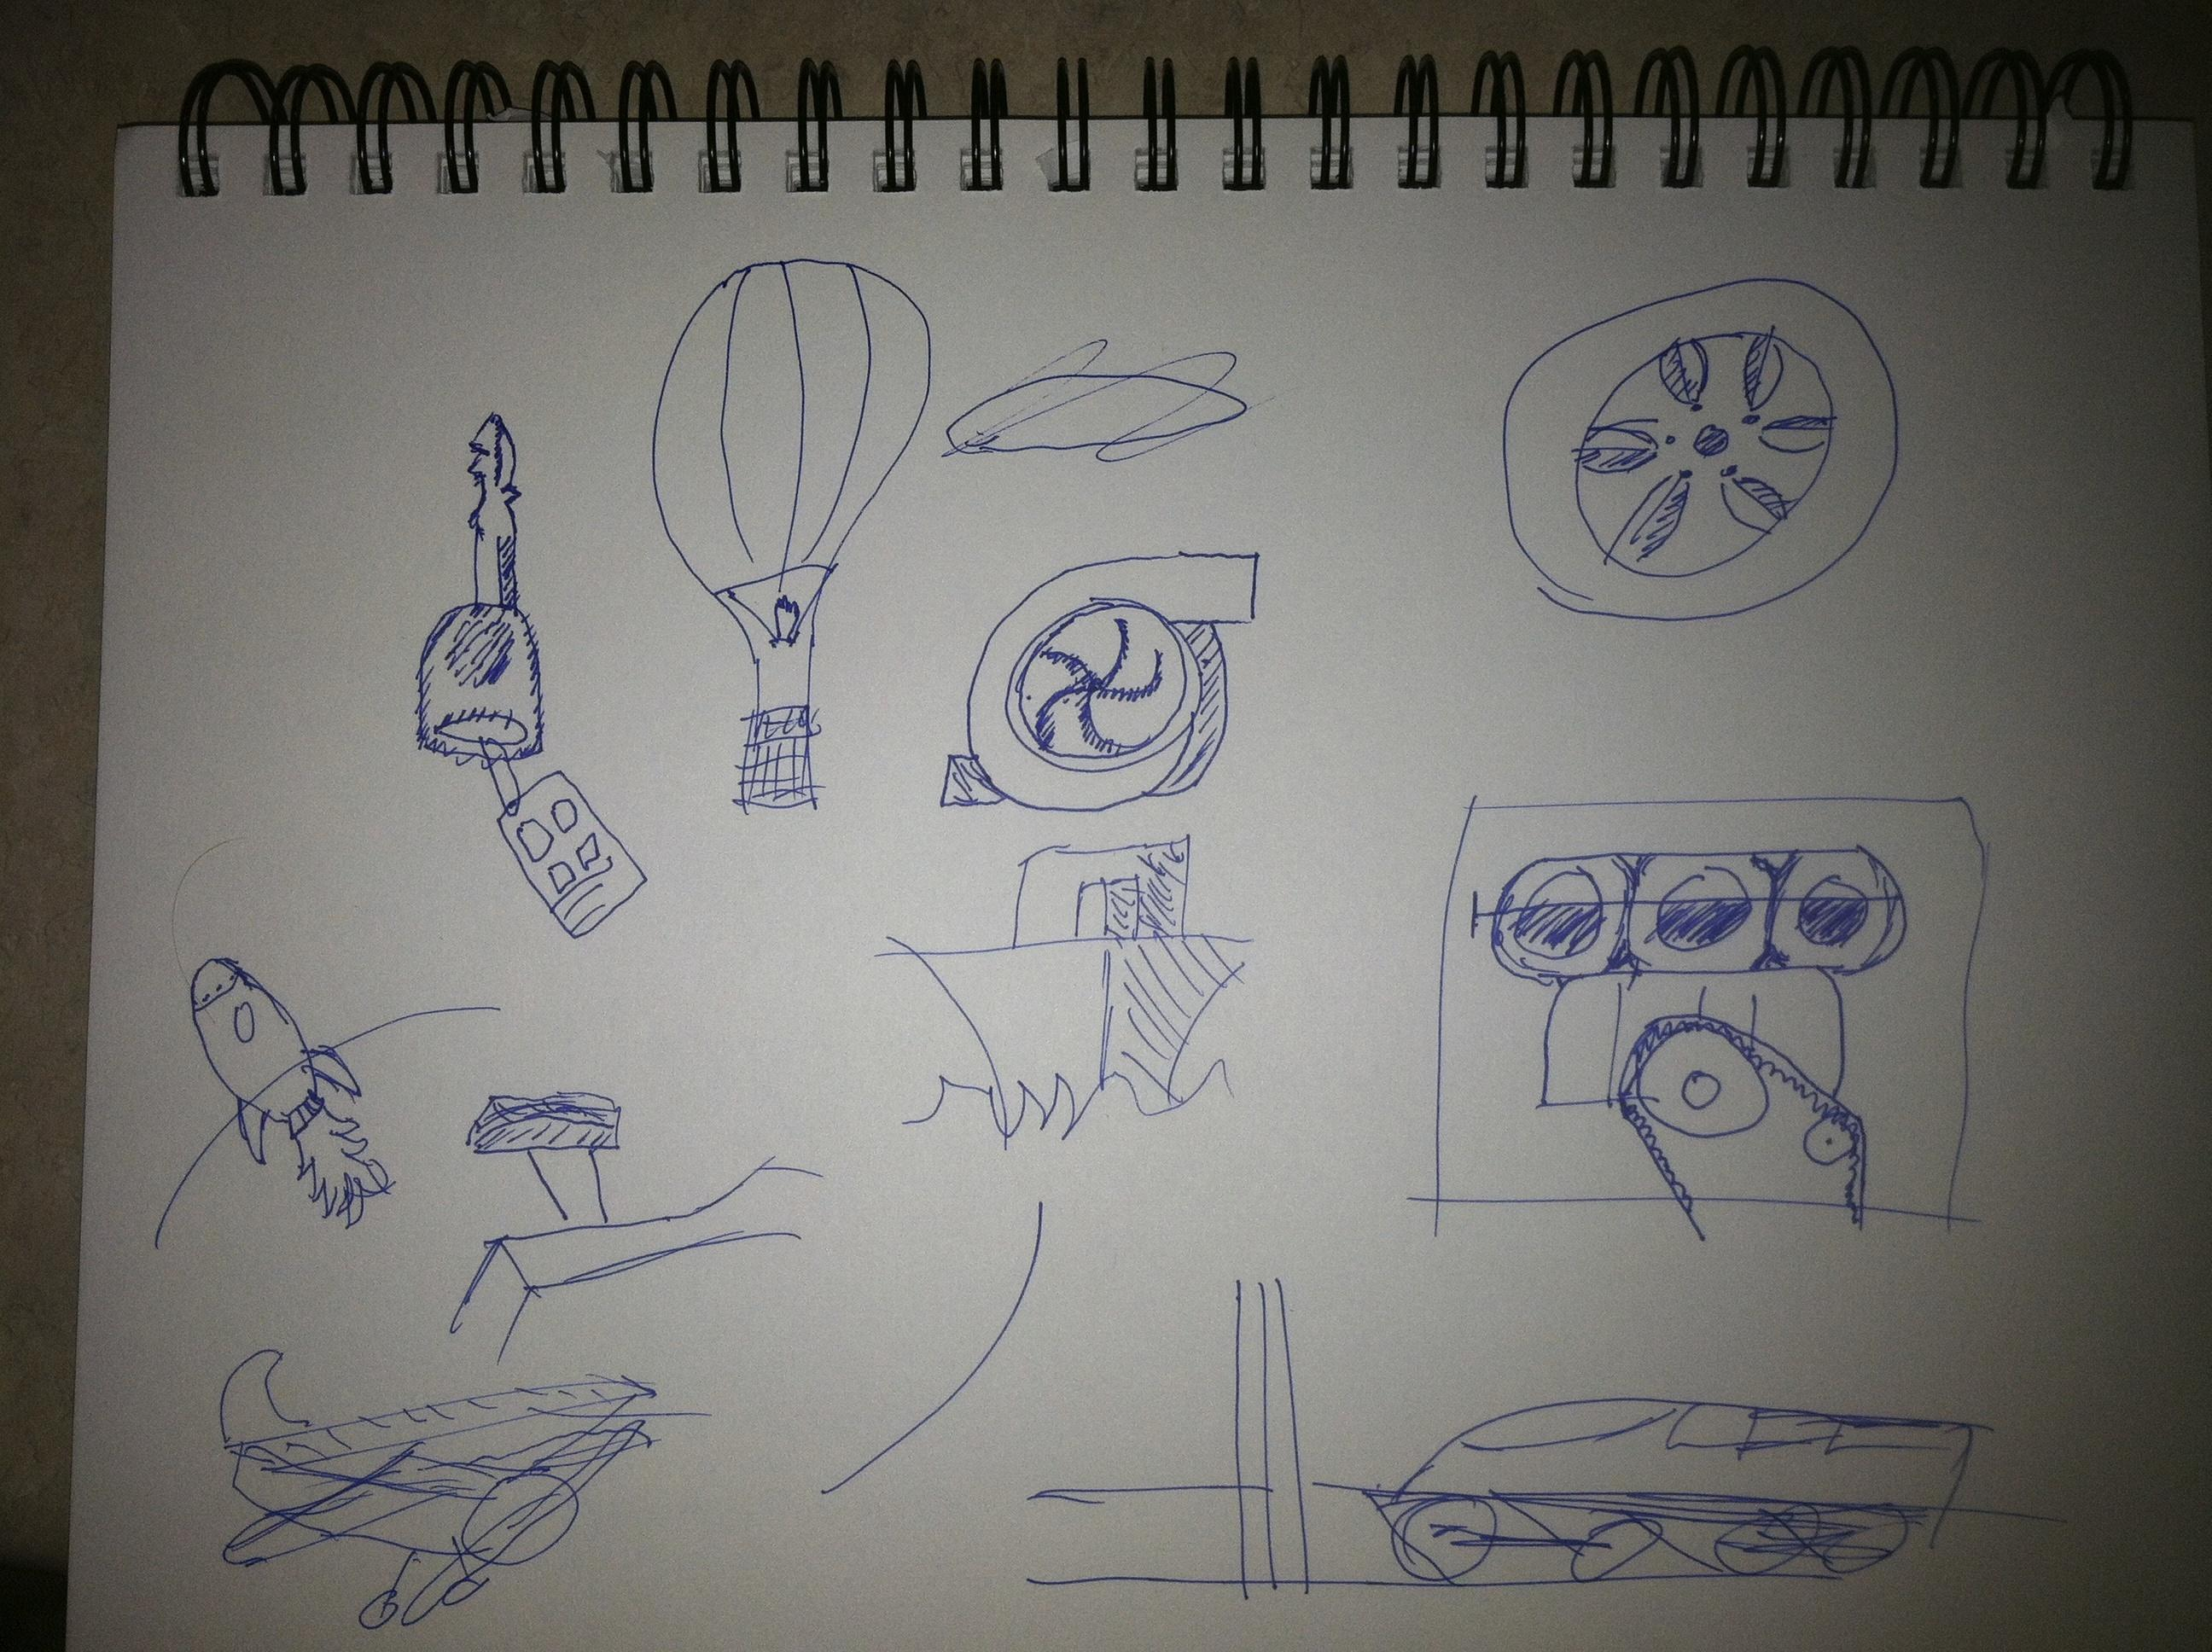 Transportation - image 3 - student project